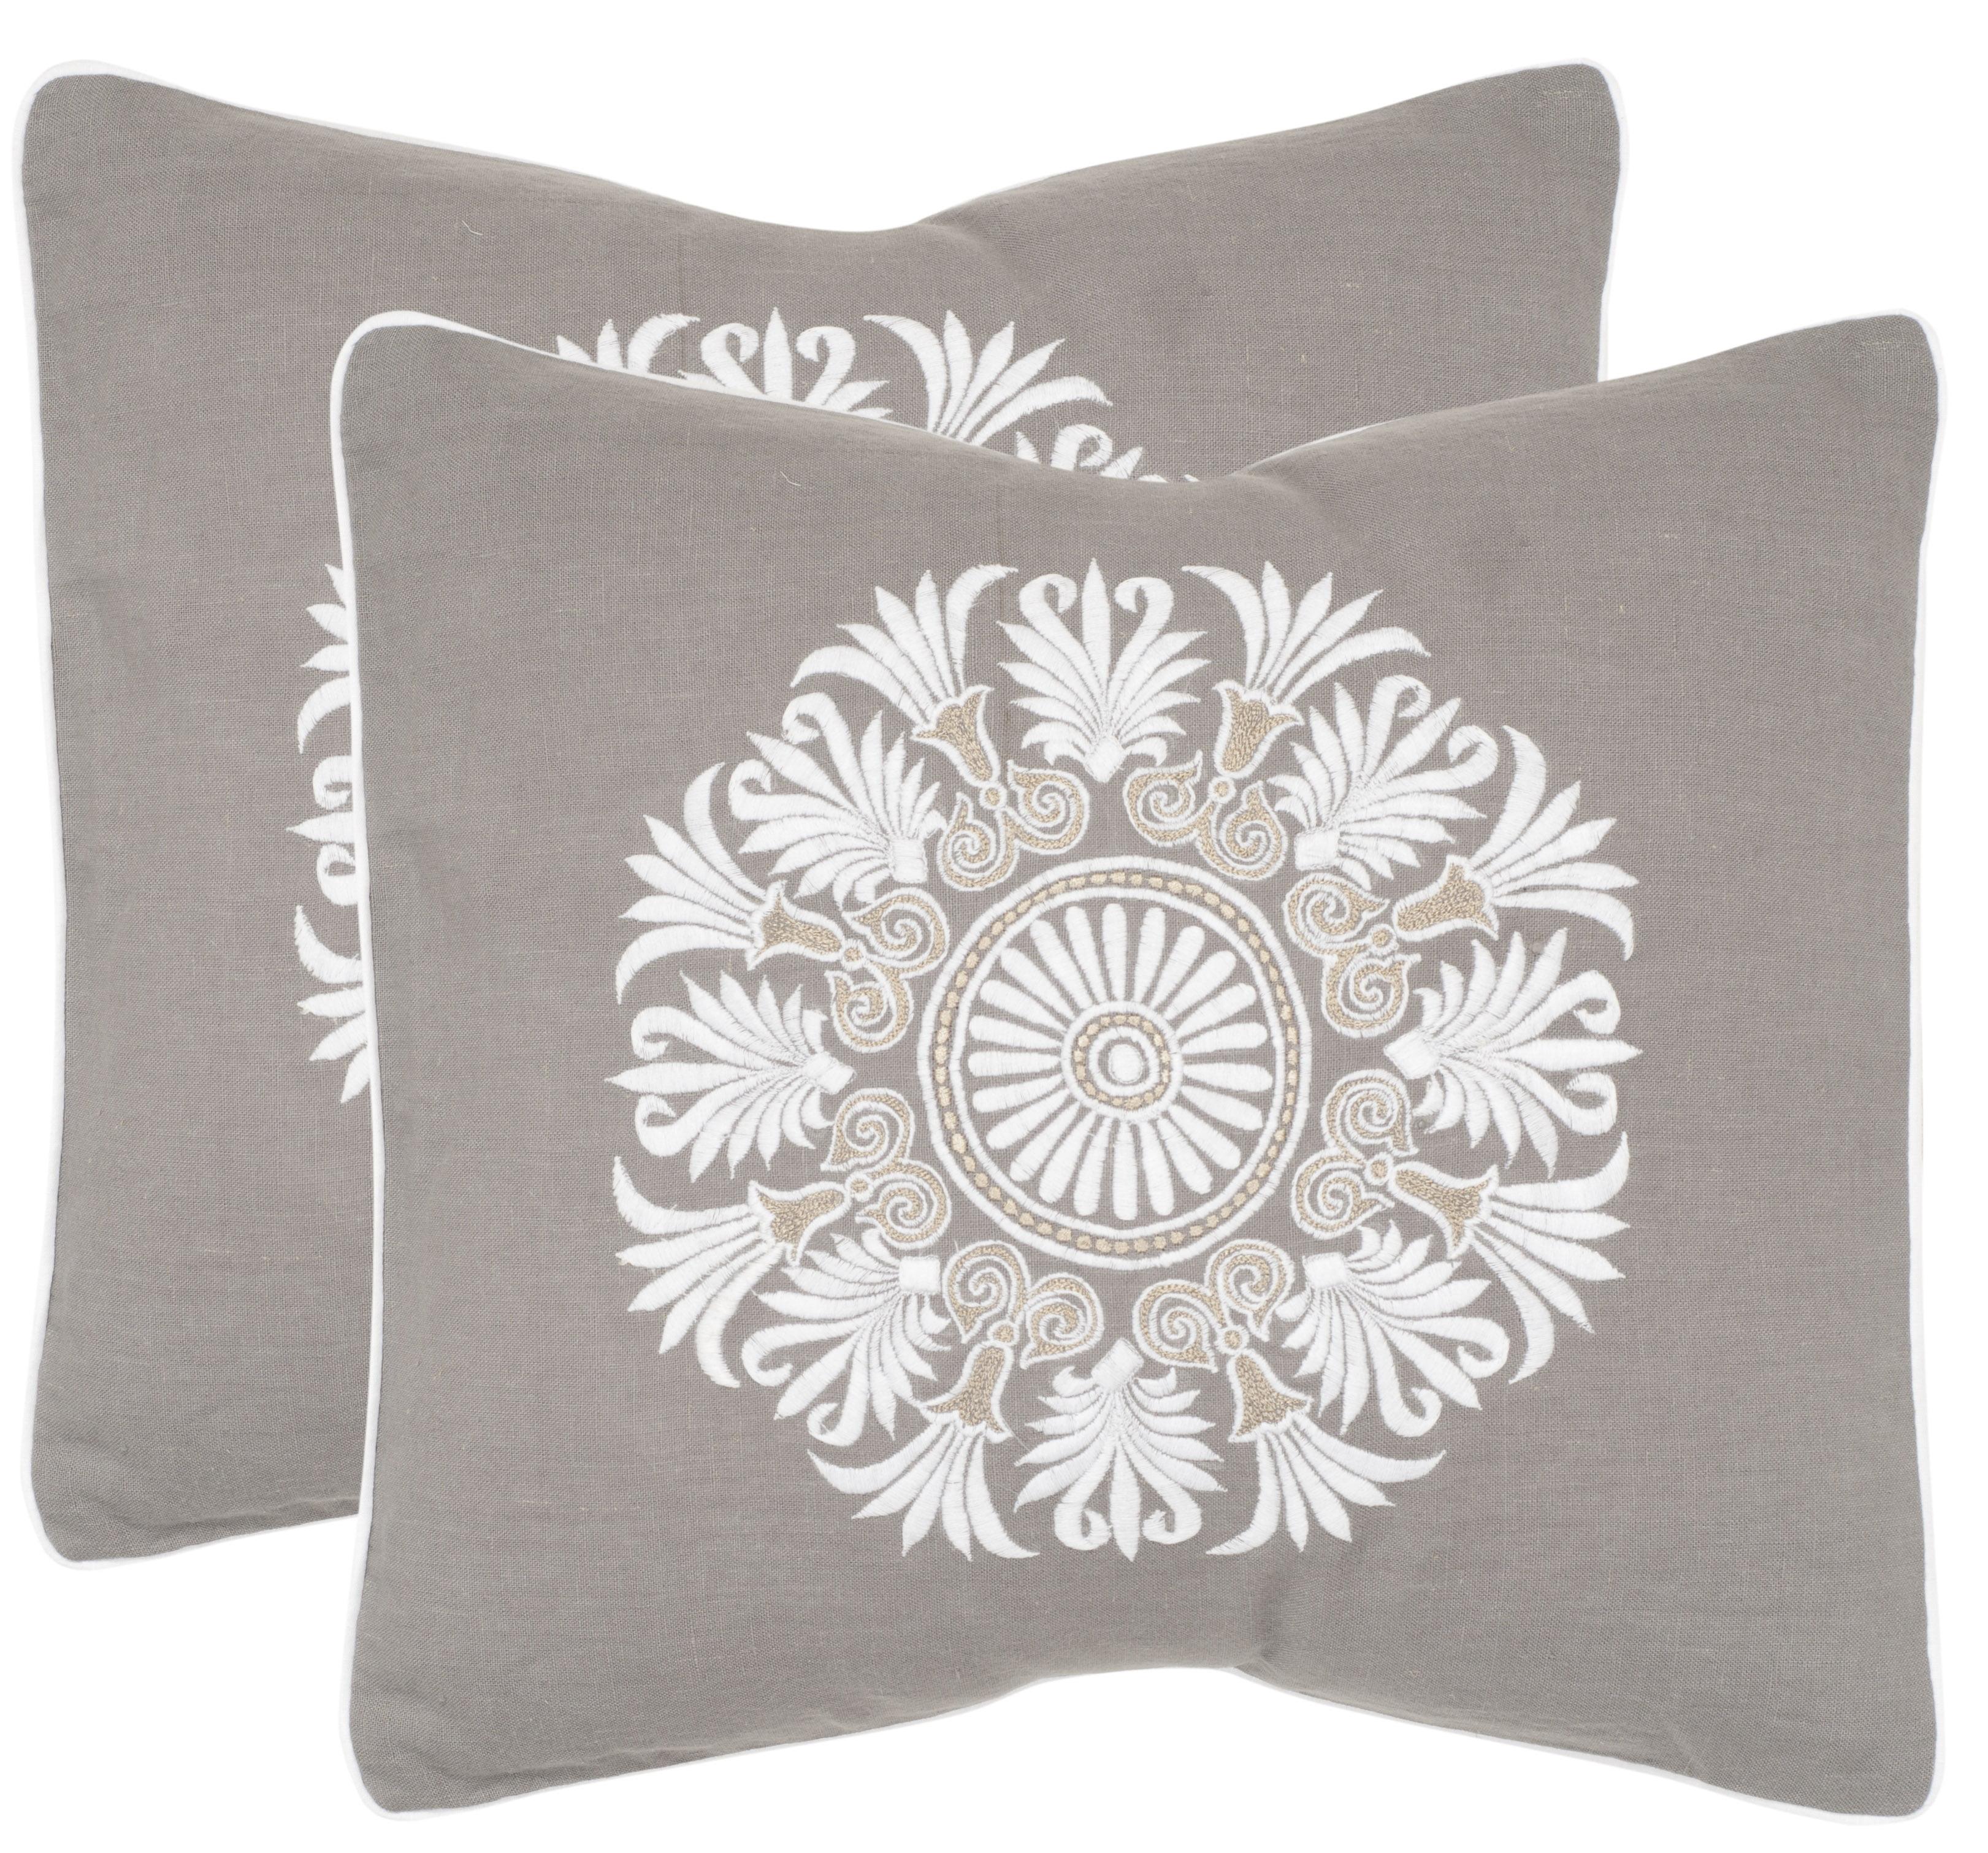 Safavieh Versailles Abstract Pillow, Set of 2